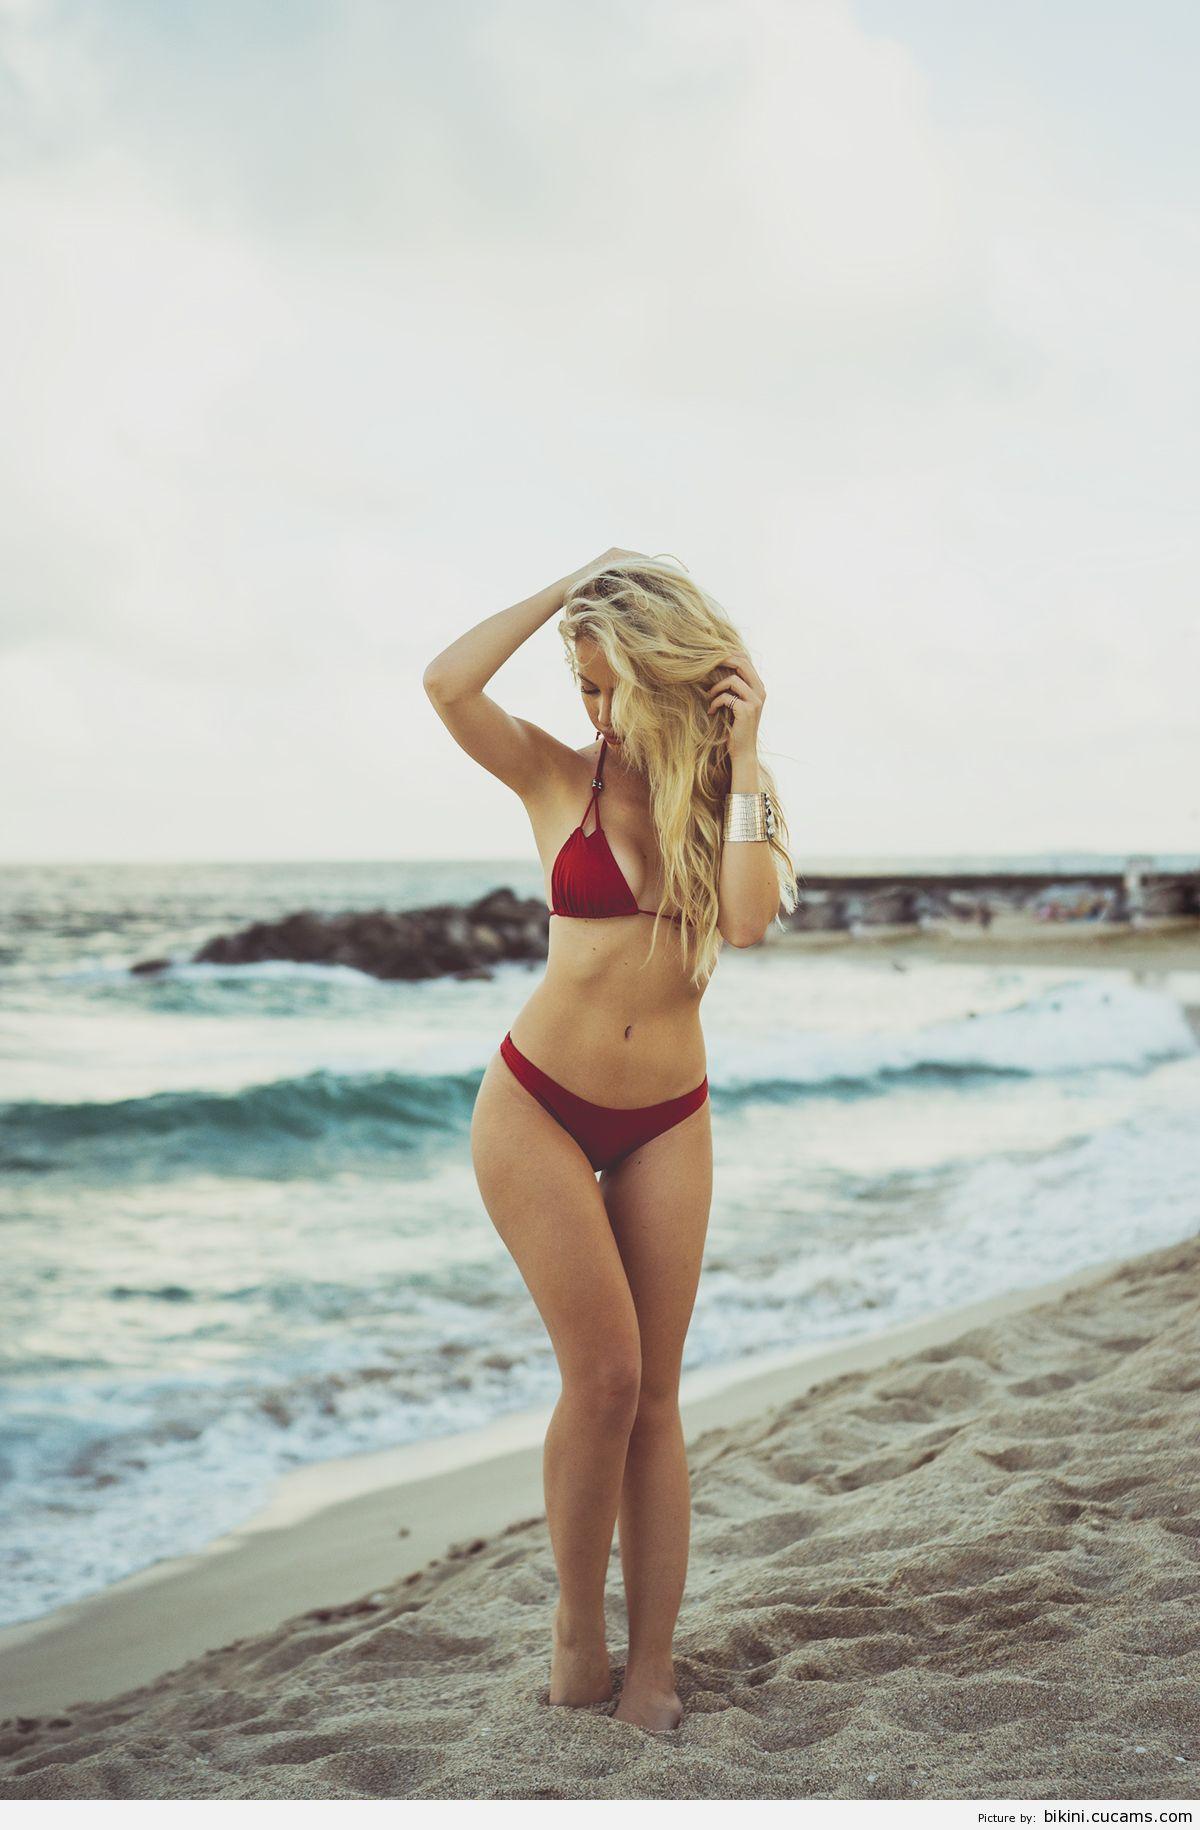 Bikini Assfucking Nextdoor by bikini.cucams.com